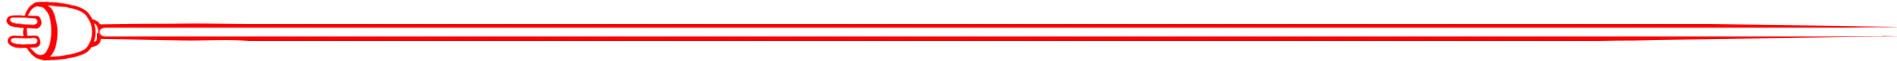 Strom vergleichen - Kapiteltrenner rotes Stromkabel links